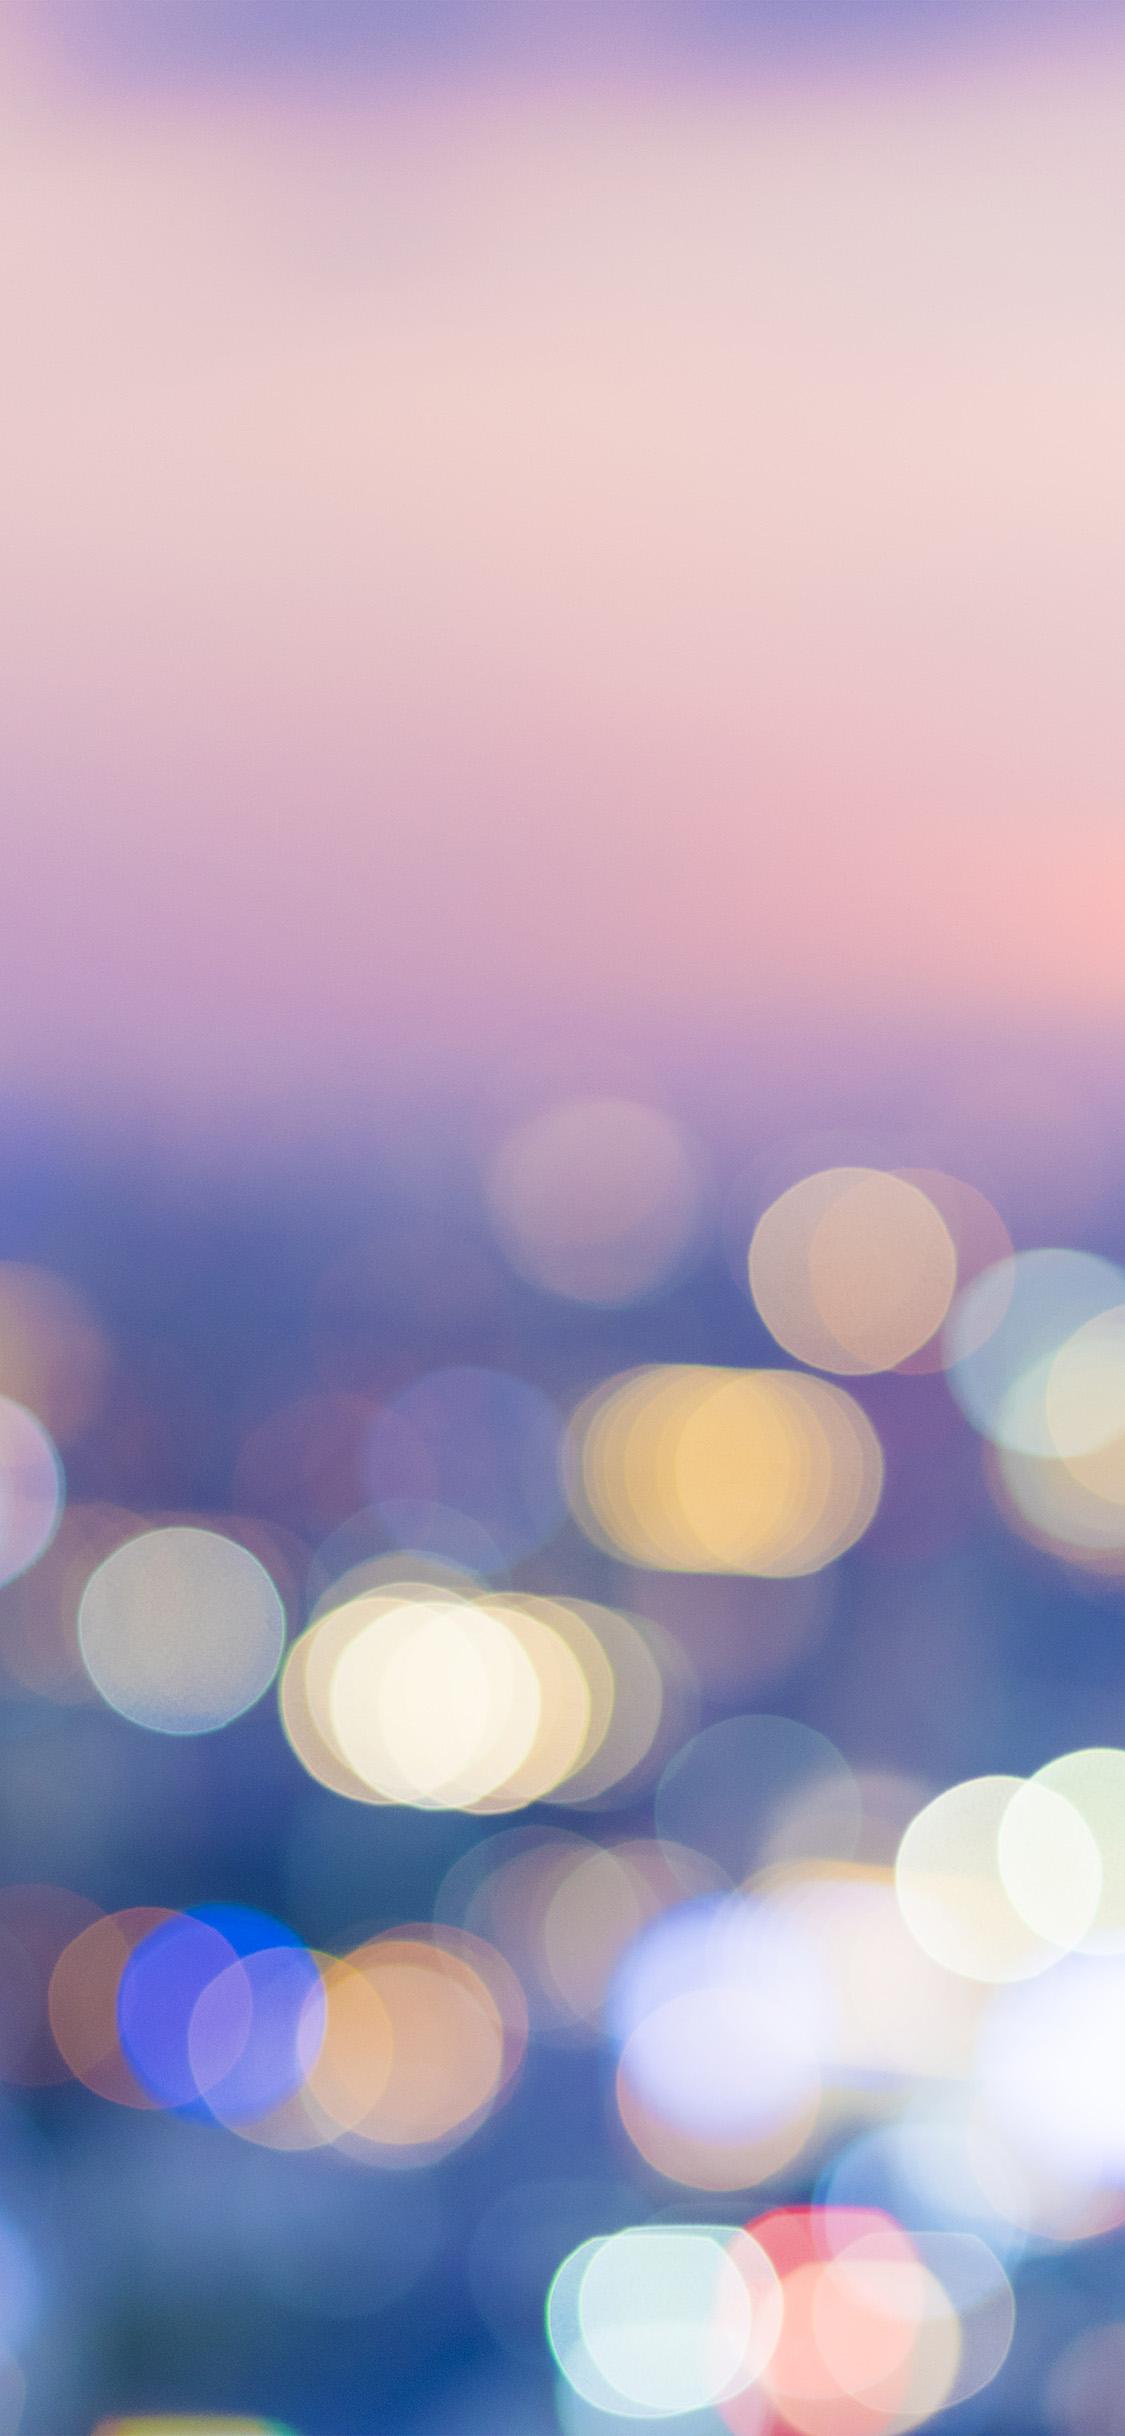 iPhonexpapers.com-Apple-iPhone-wallpaper-nx38-bokeh-art-pink-city-nature